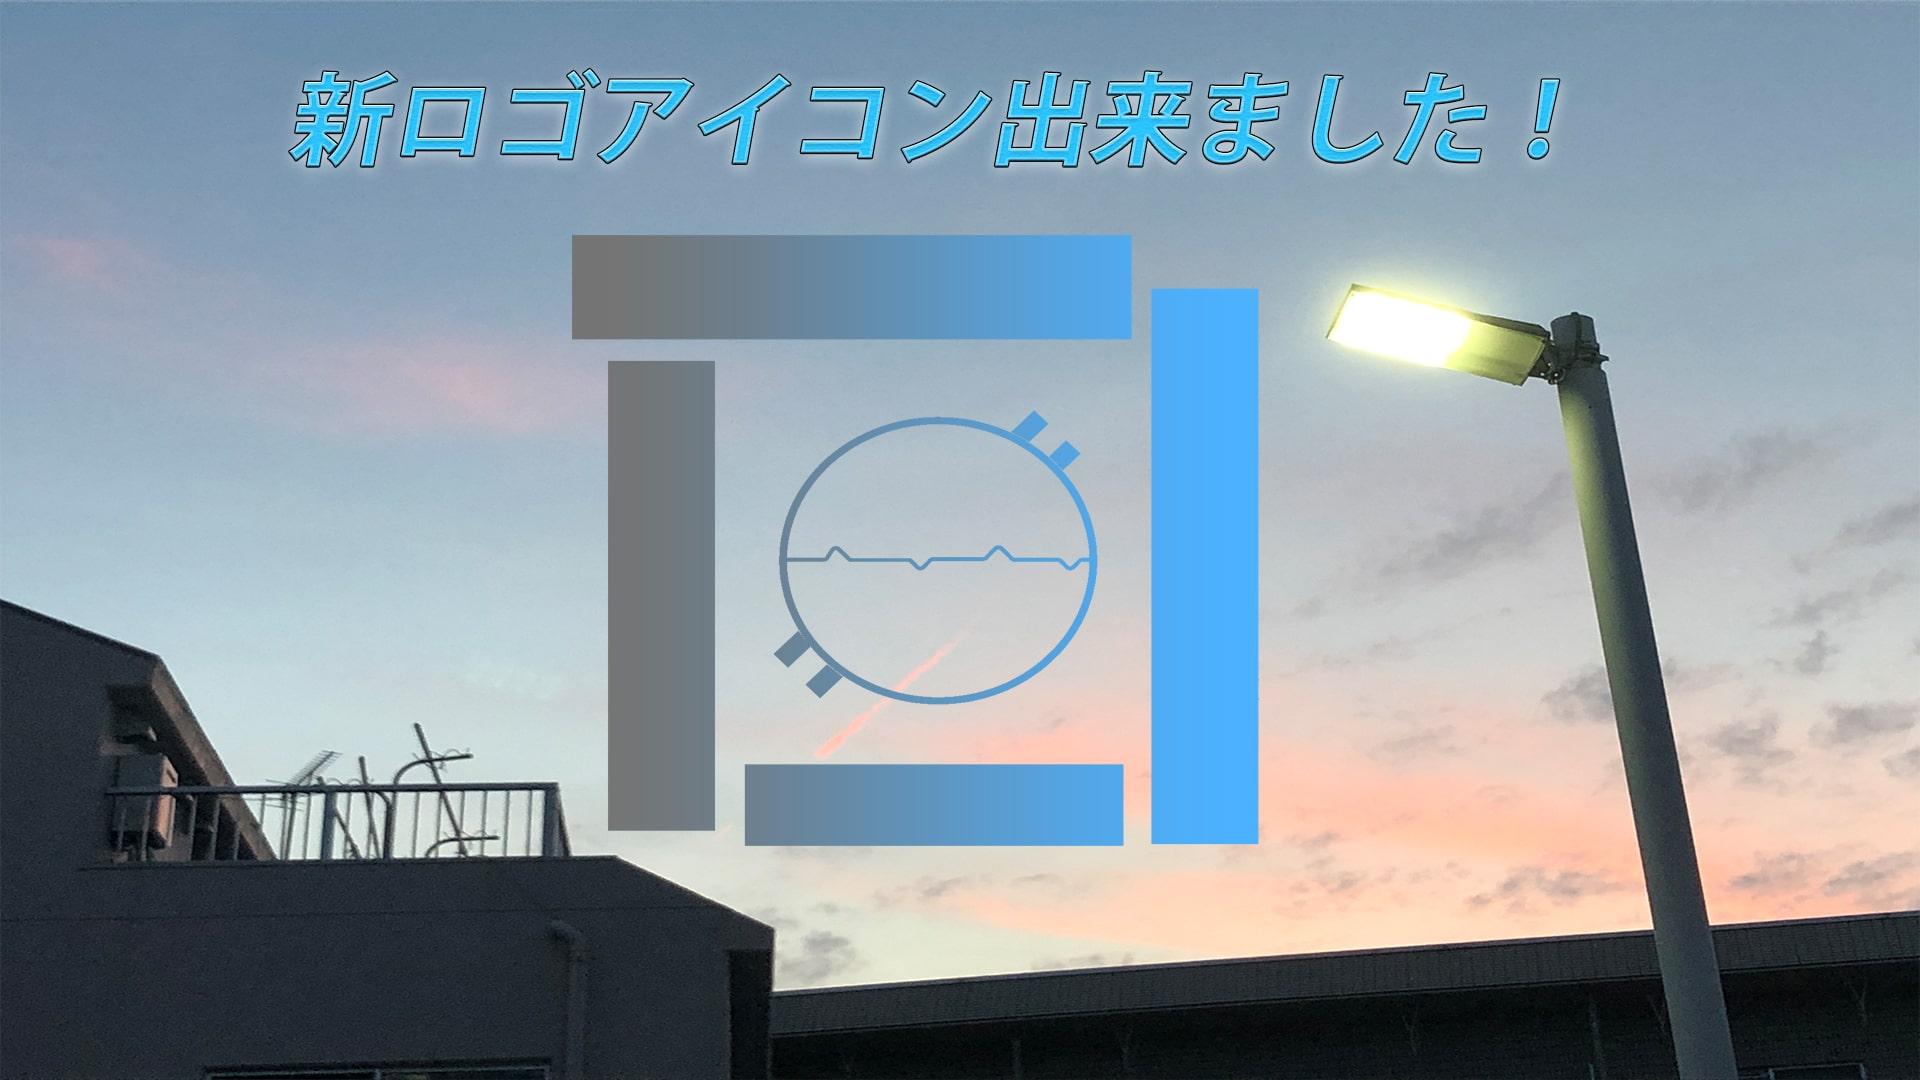 kamiyablog デサインを色々と変更しました。ロゴから背景まで